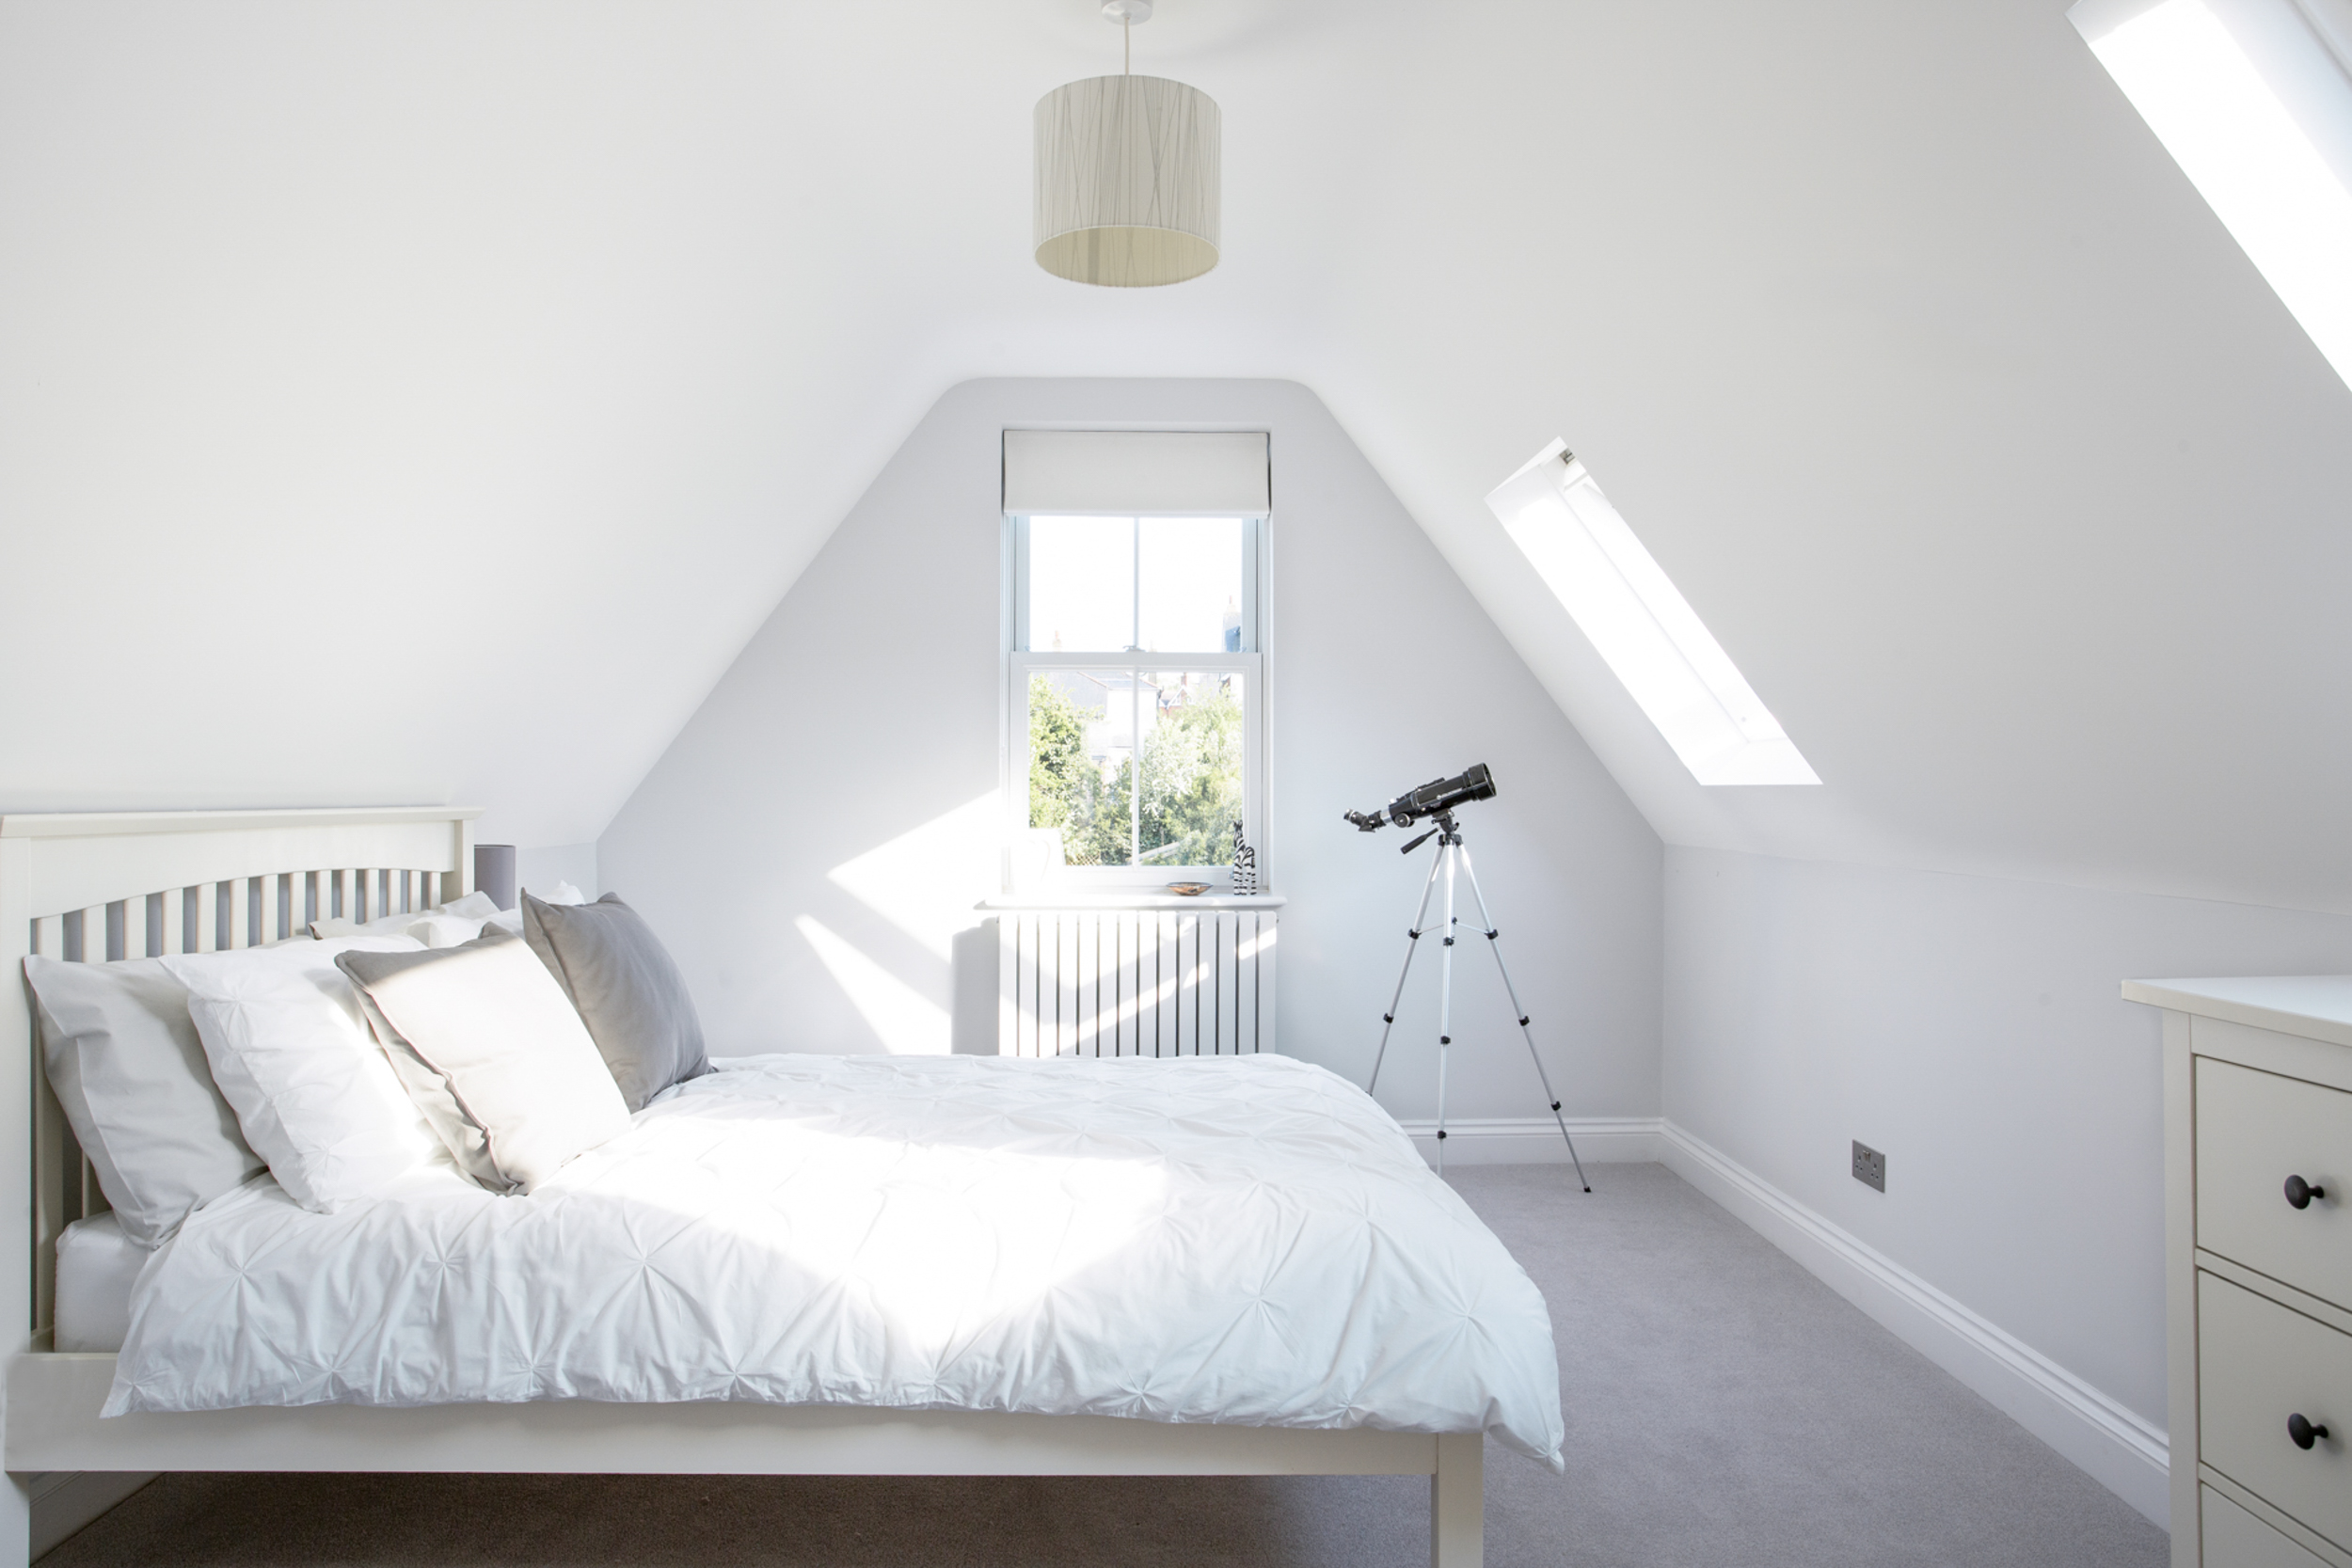 Bedroom with telescope regraded Feb 2017.jpg